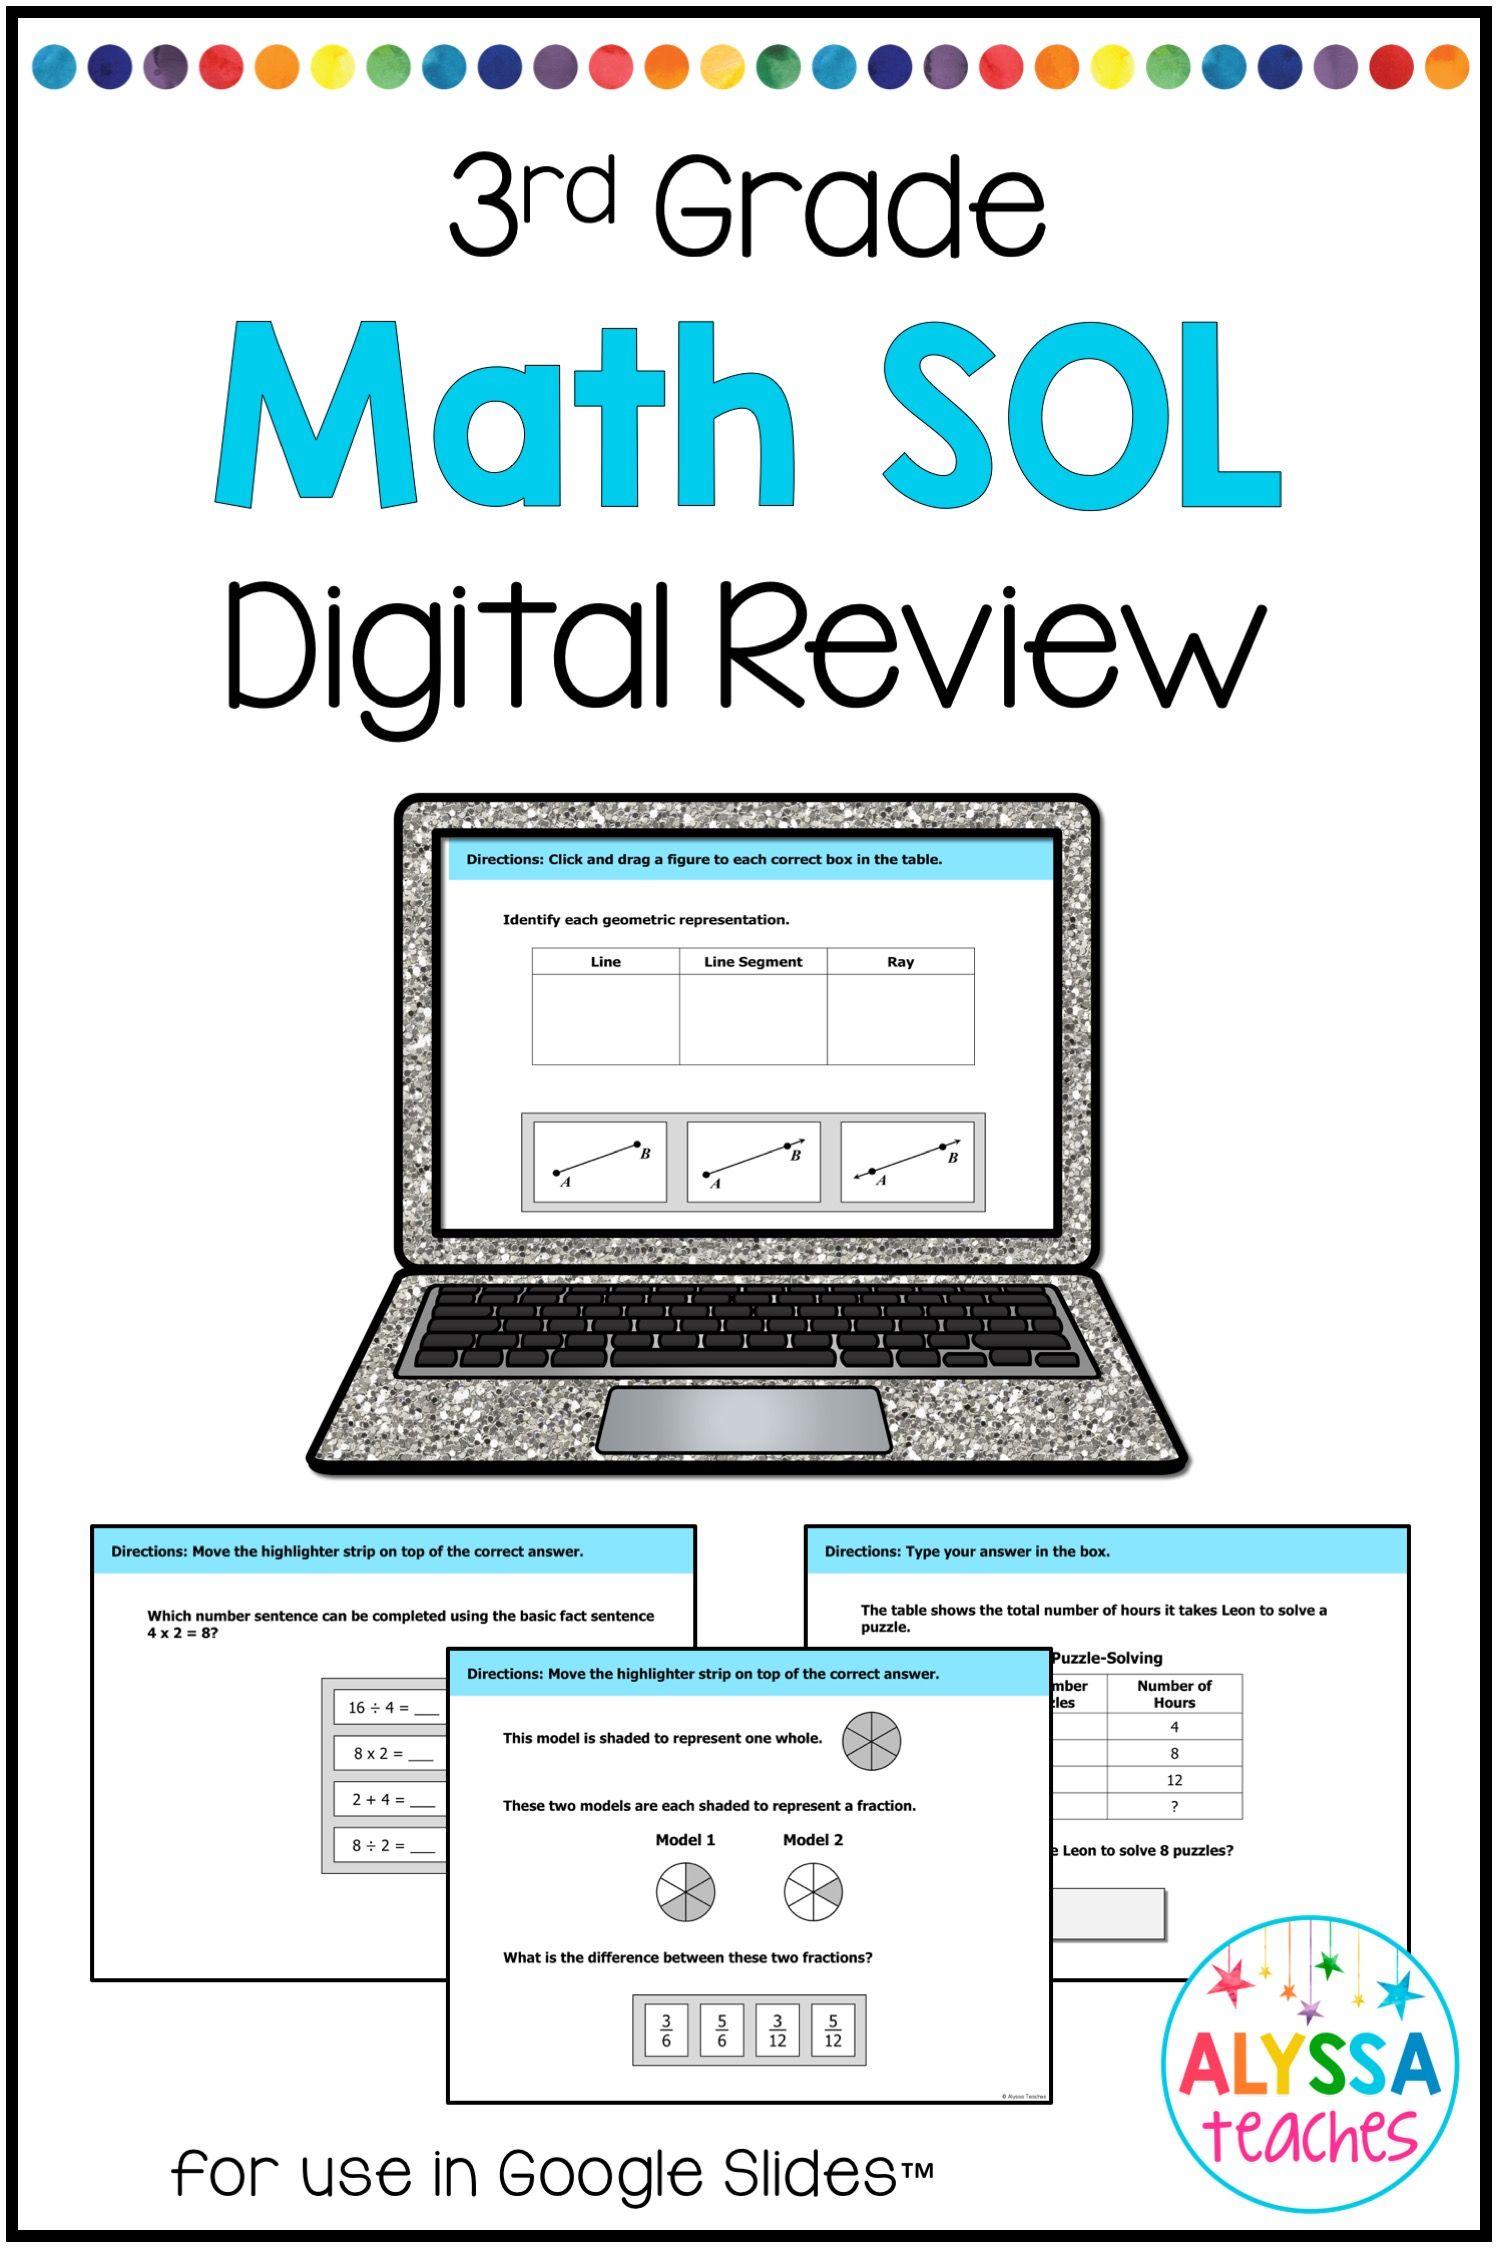 Third Grade Math Sol Tei Questions Digital Review